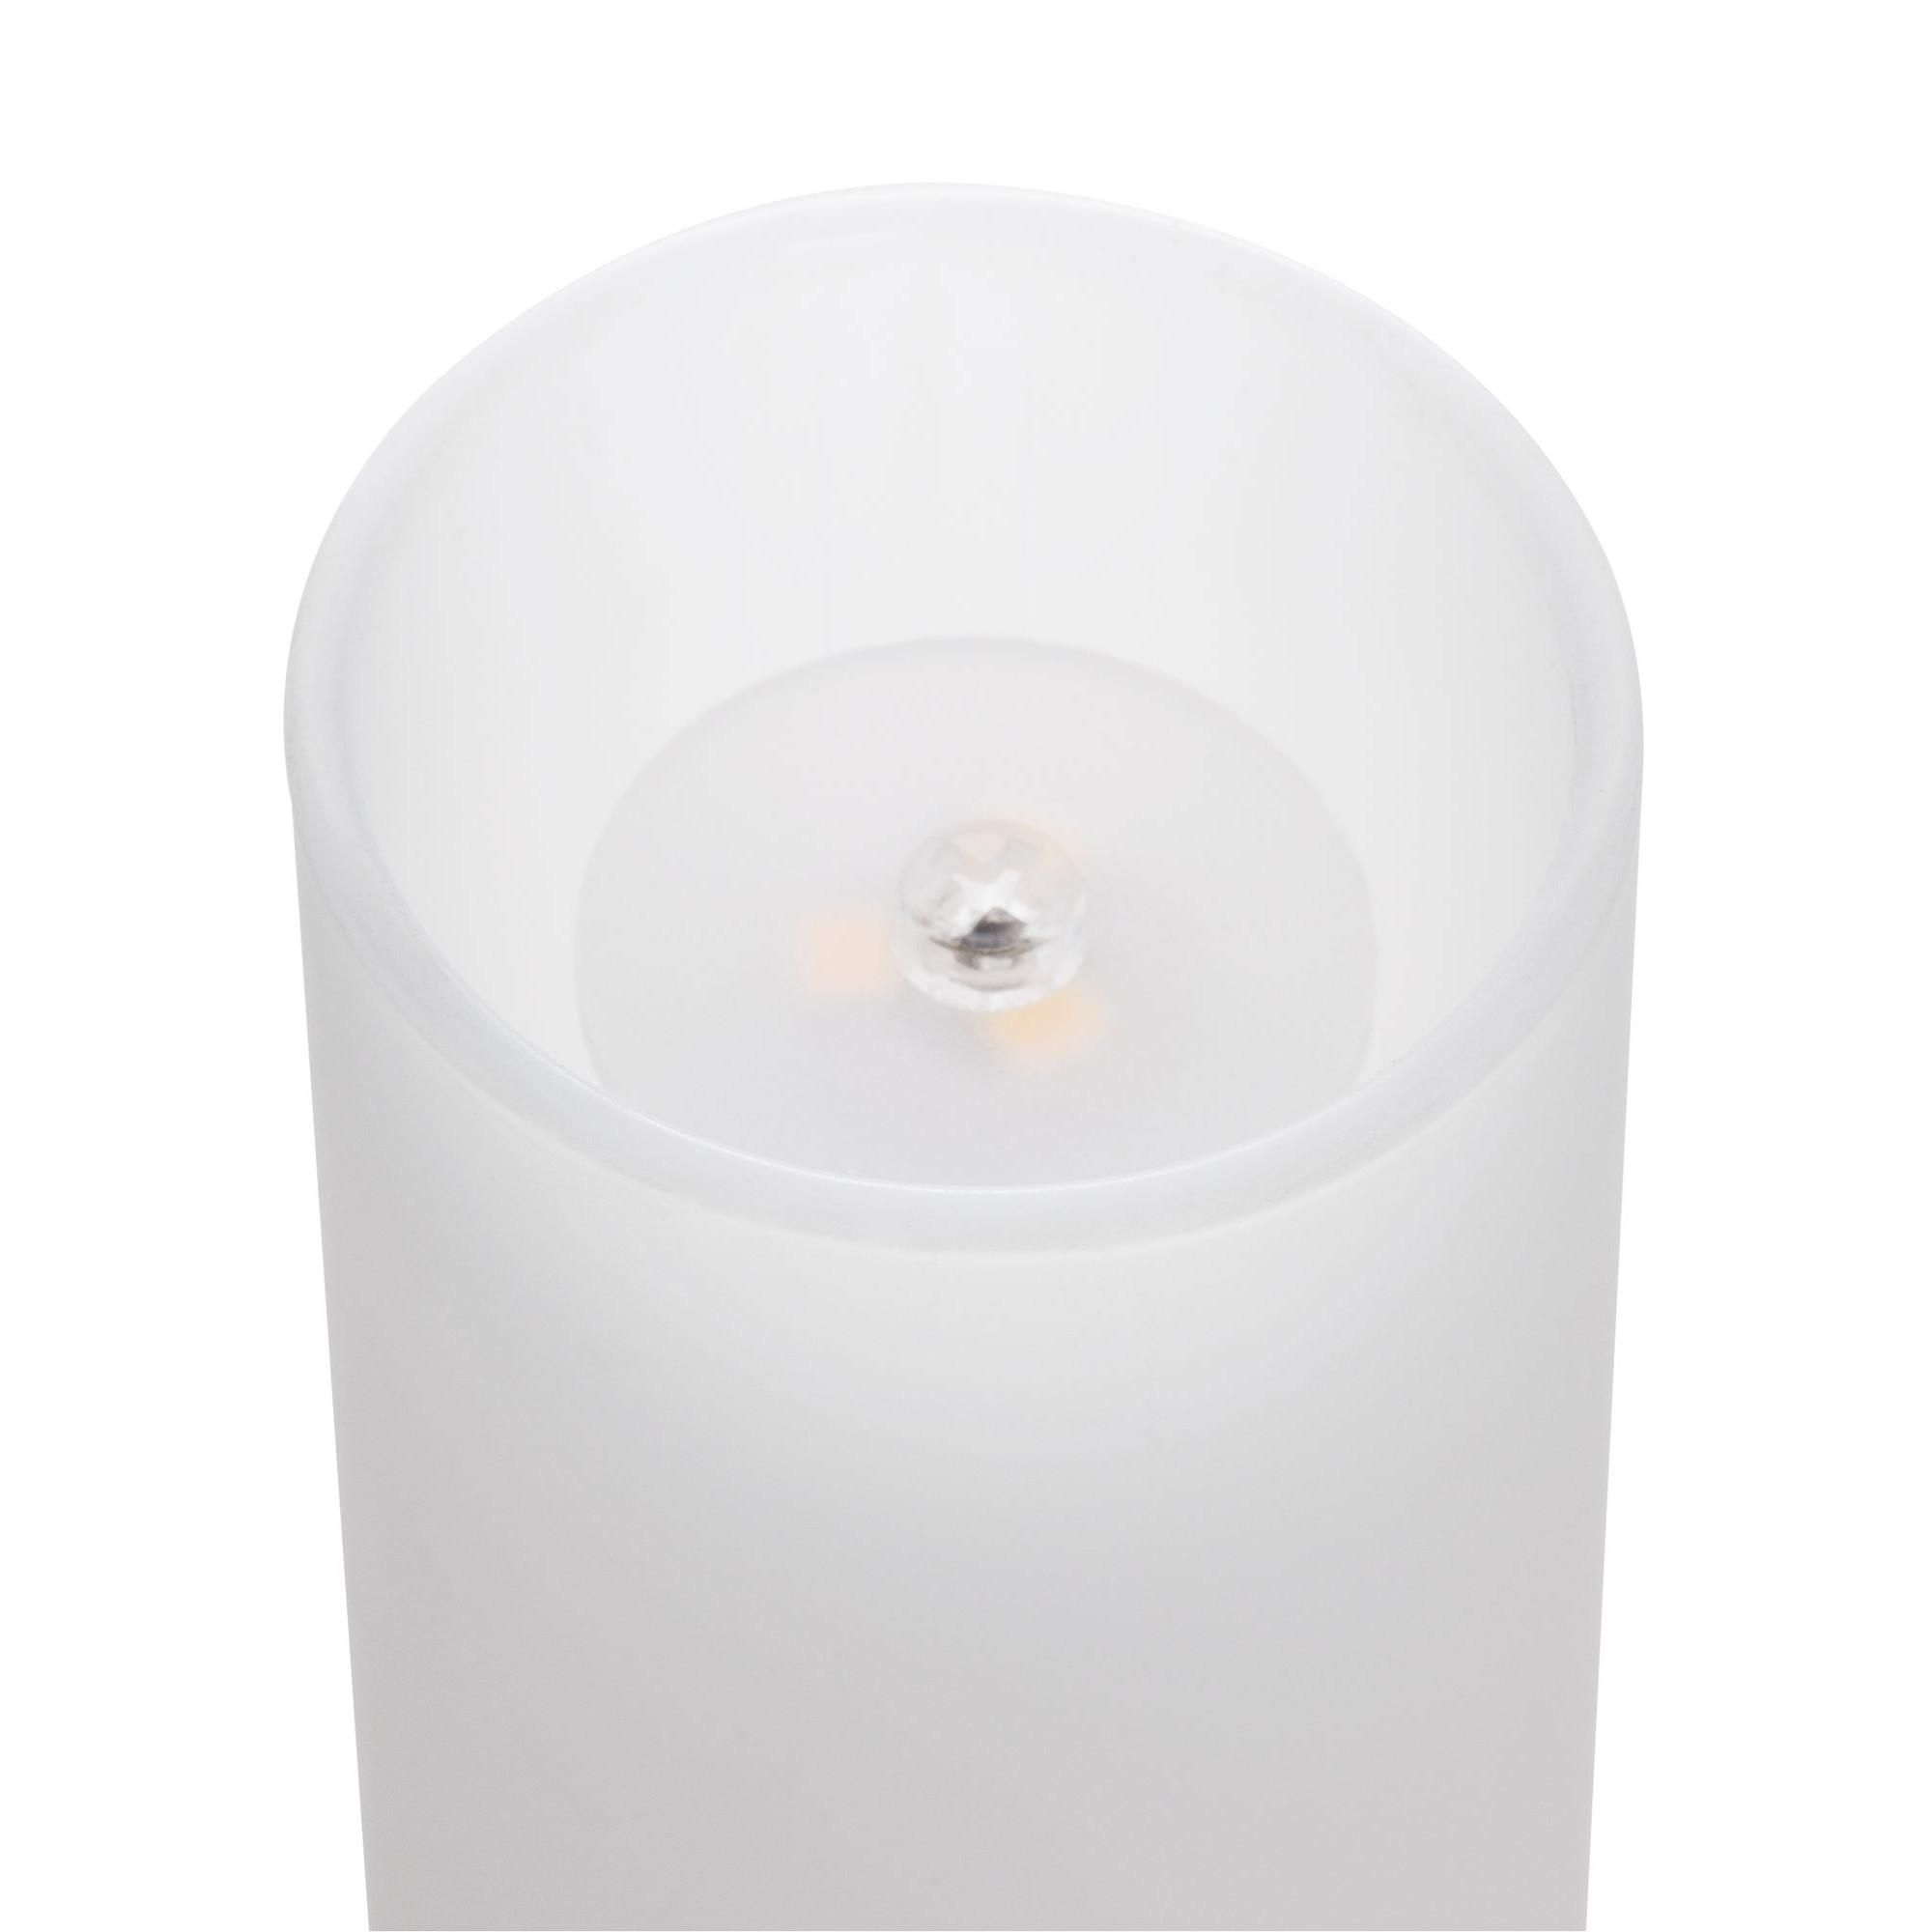 Лампа светодиодная Paulmann Deco Pipe Трубка 6Вт 520лм 2700K E27 230В Сатин Дим. 28436.